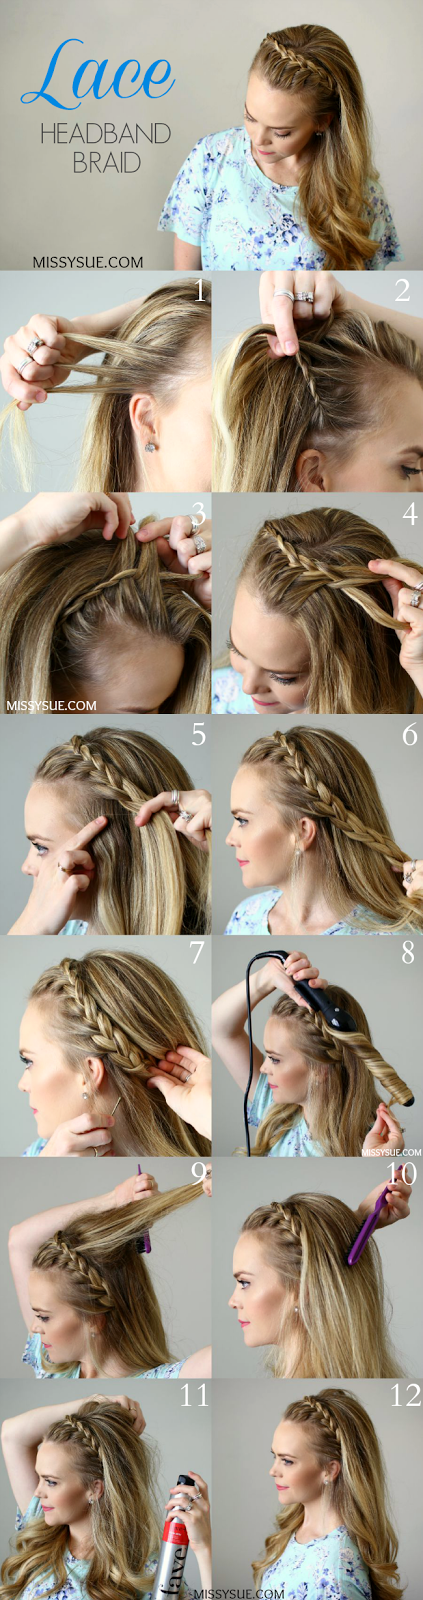 http://missysue.com/2015/08/lace-headband-braid/